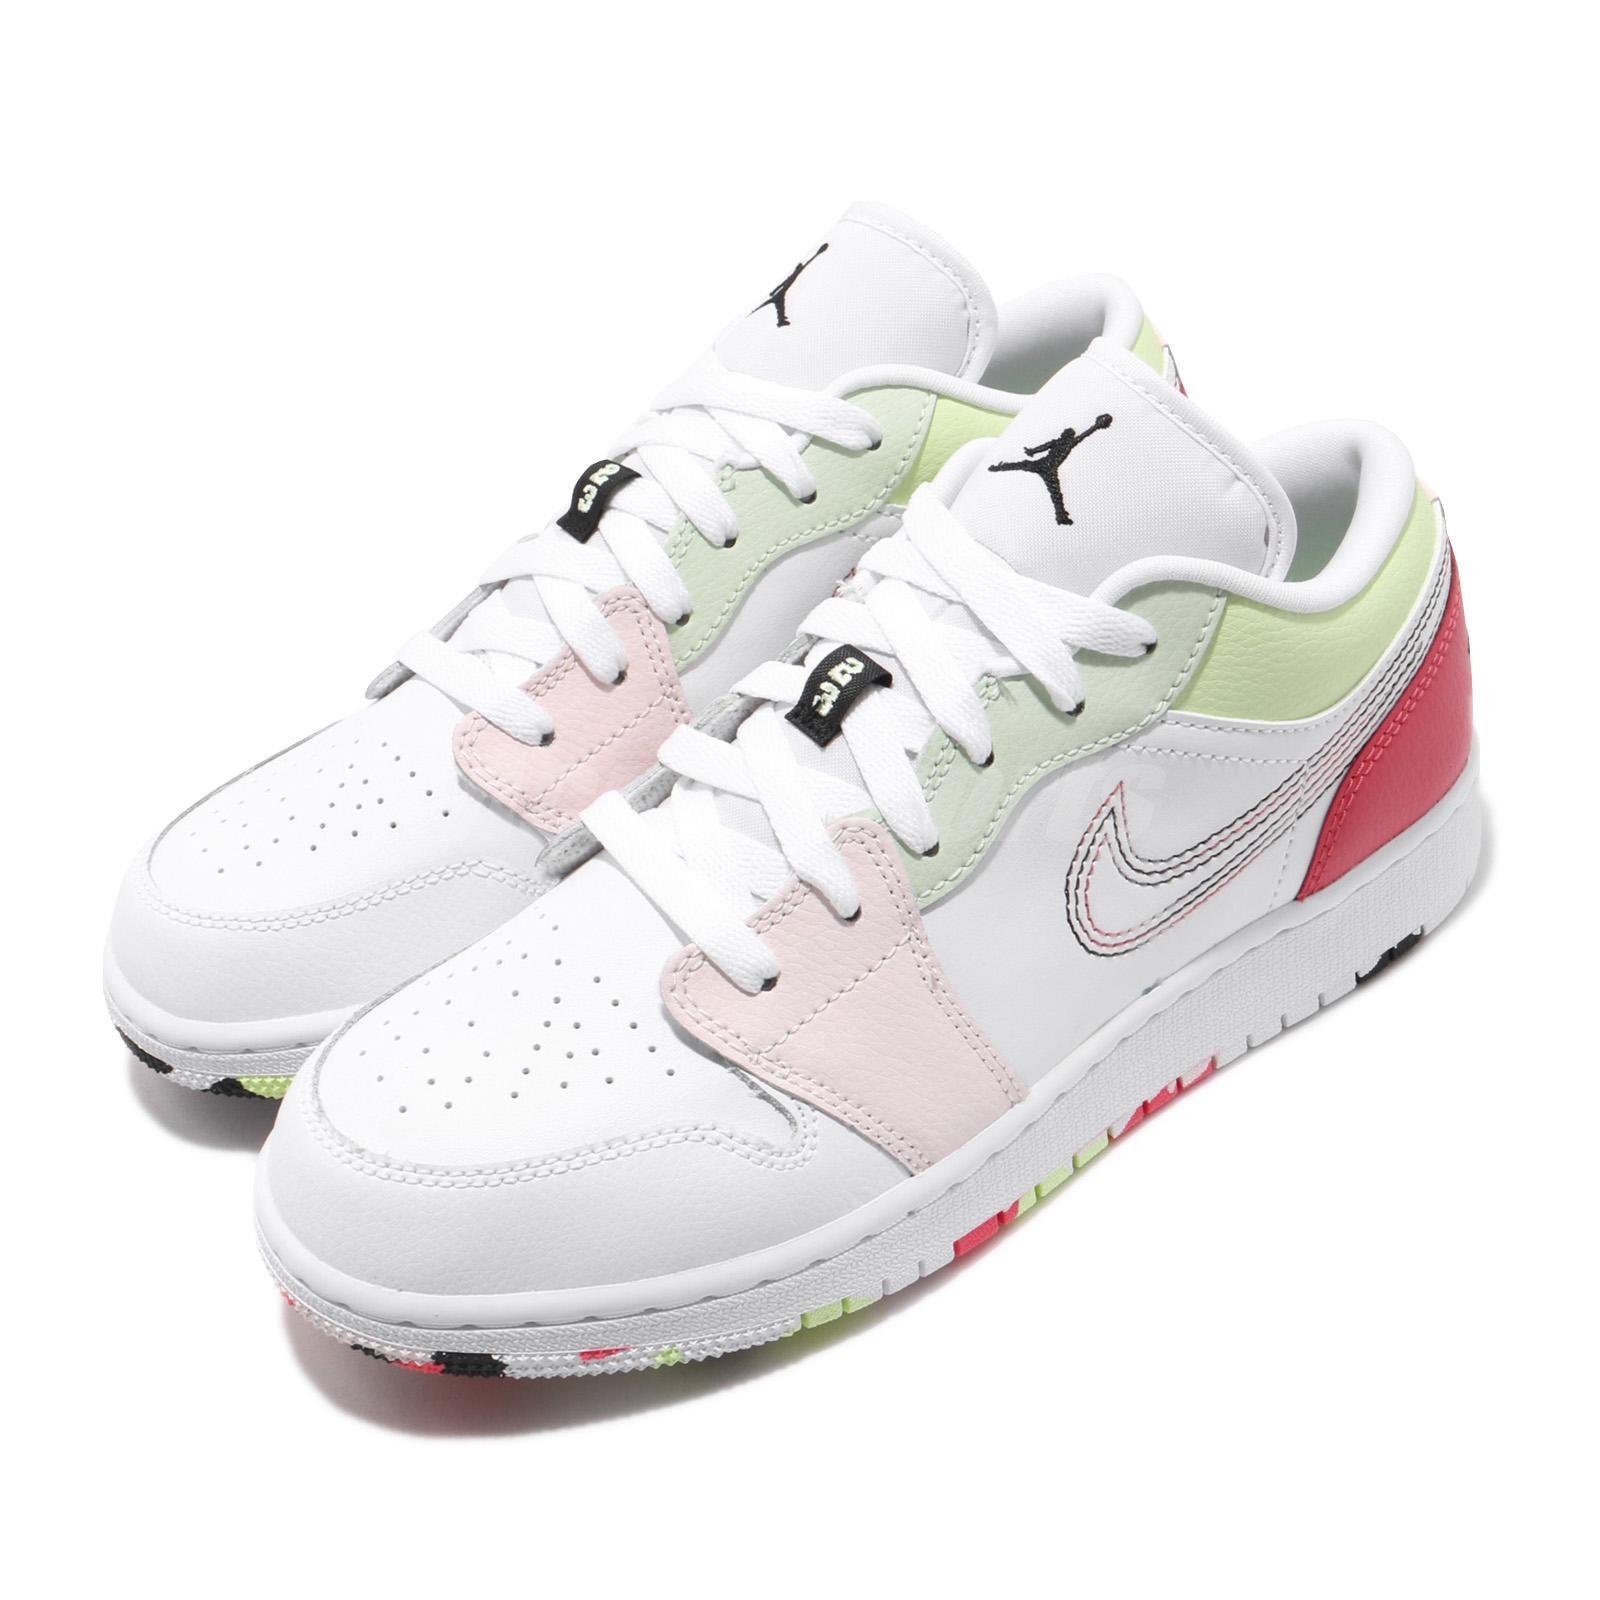 best website 51618 1cec4 Details about Nike Air Jordan 1 Low GS AJ1 I Candy Camo White Pink Kid  Women Shoes 554723-176